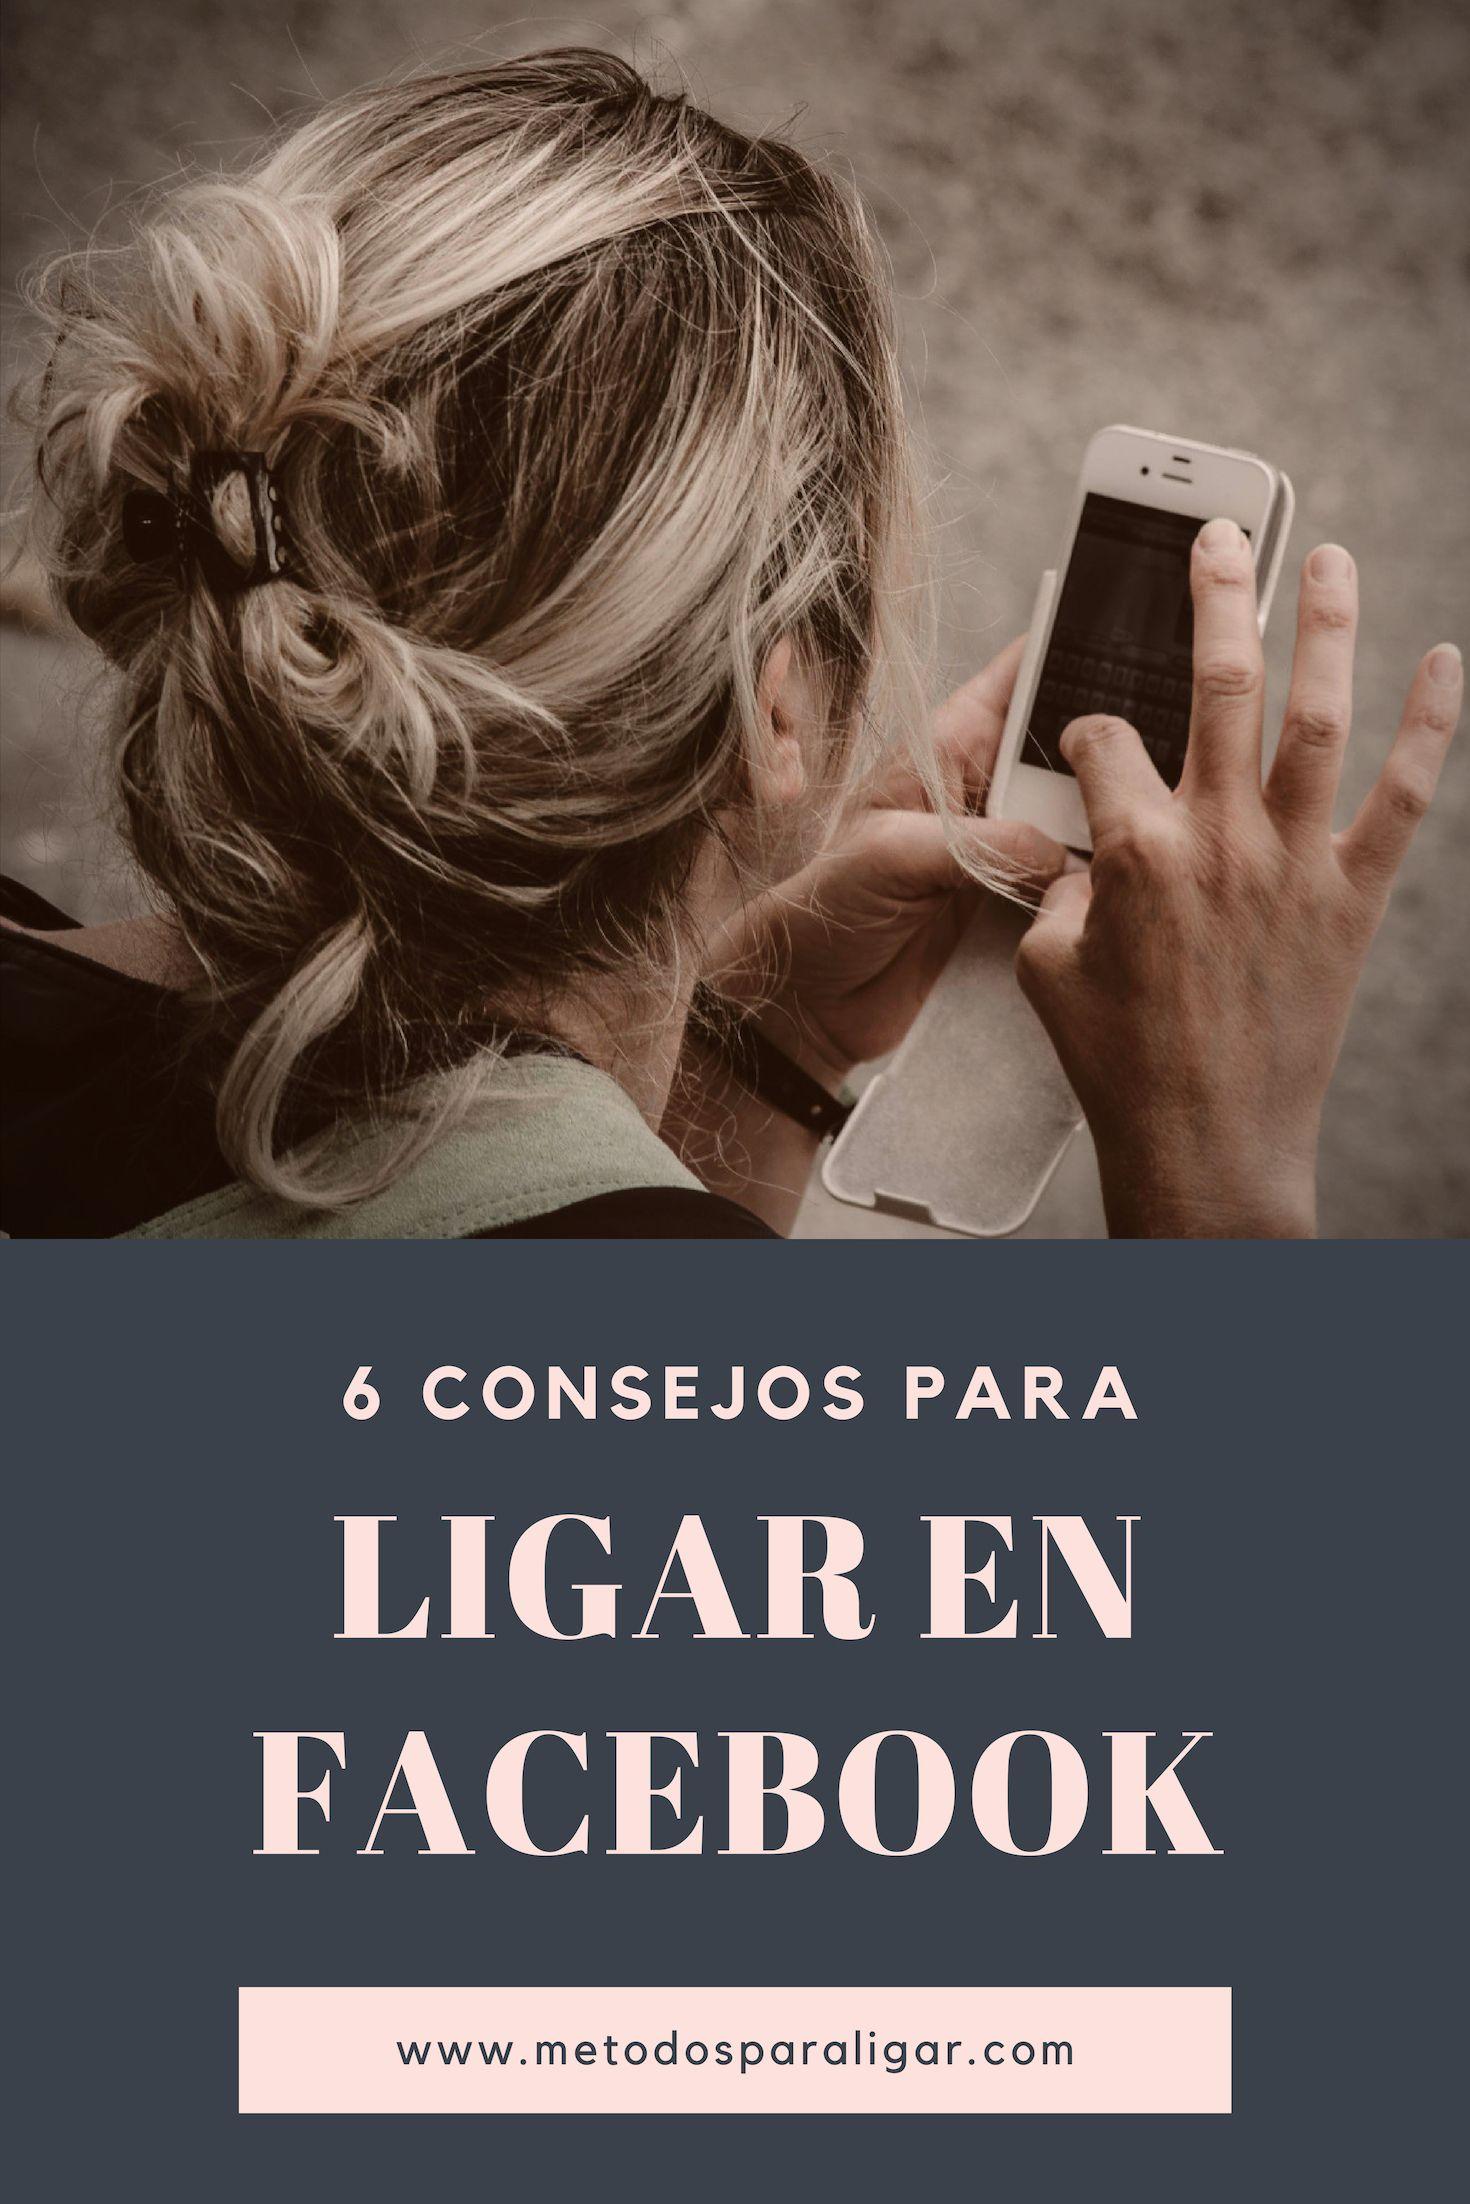 6 Consejos Para Ligar En Facebook Métodos Para Ligar Lockscreen Person